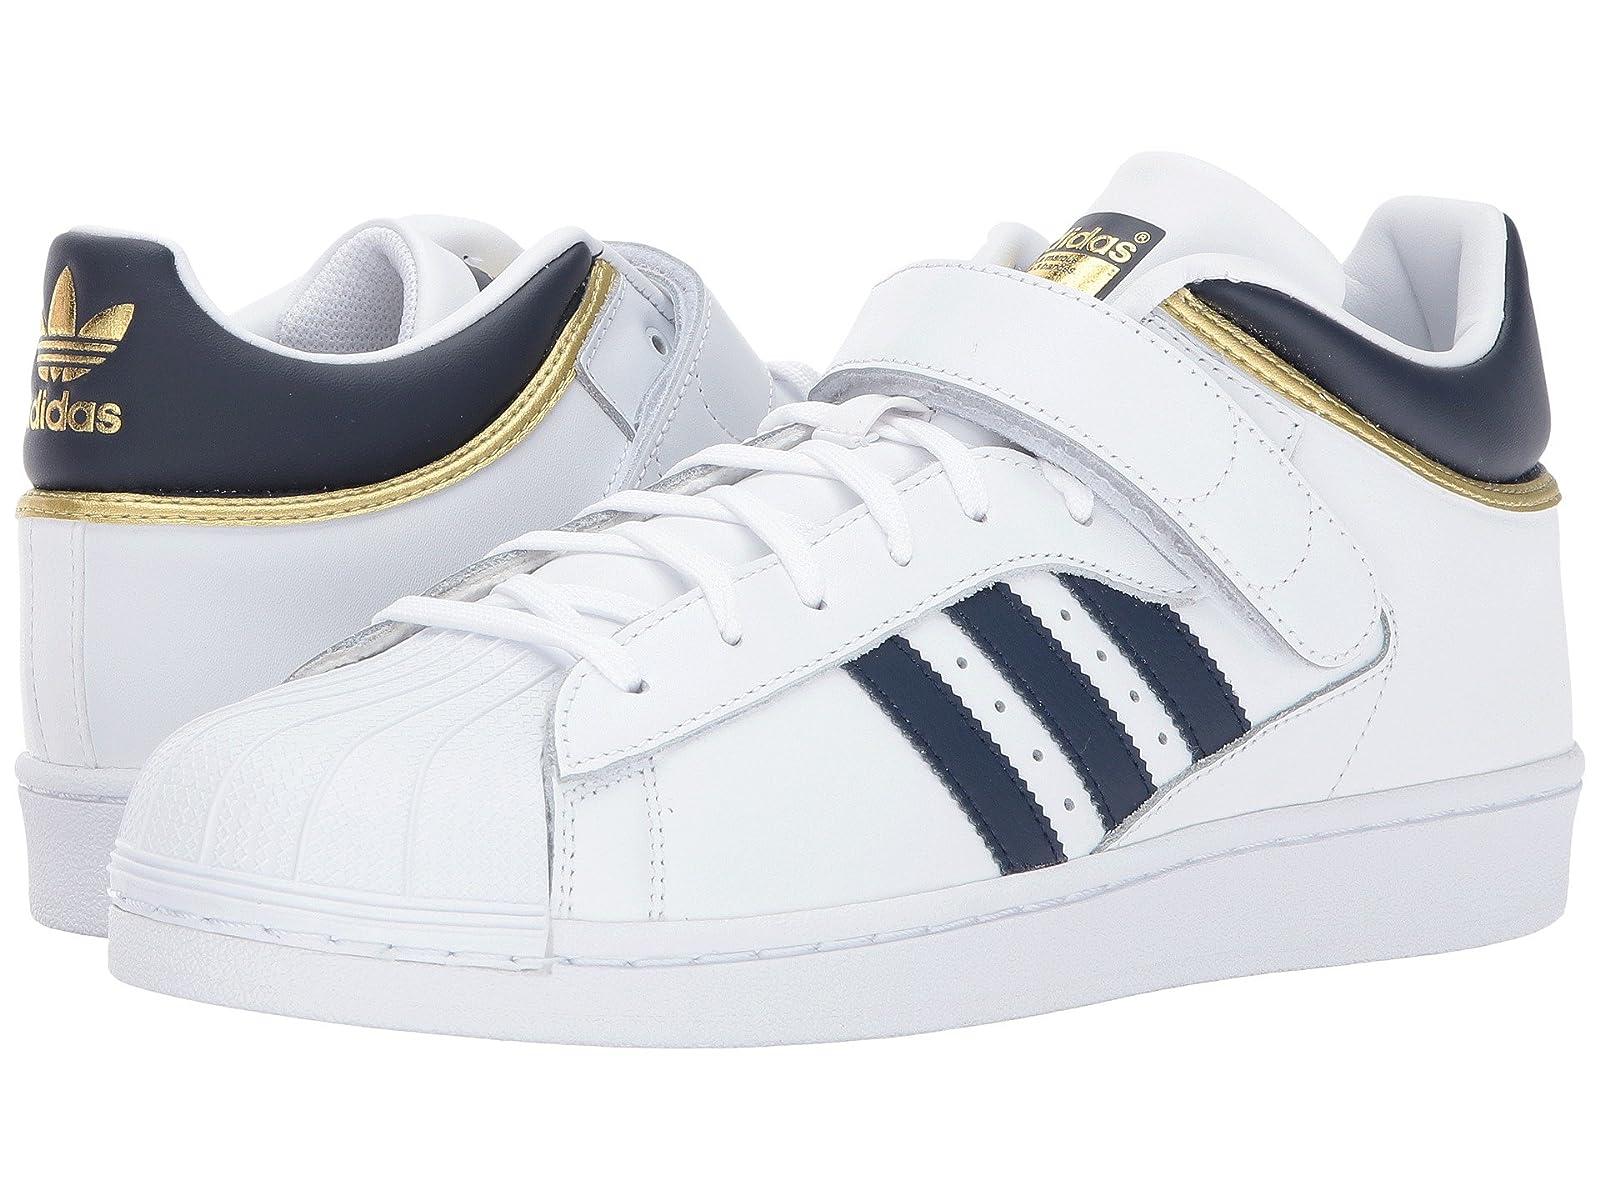 adidas Originals Pro ShellStylish and characteristic shoes